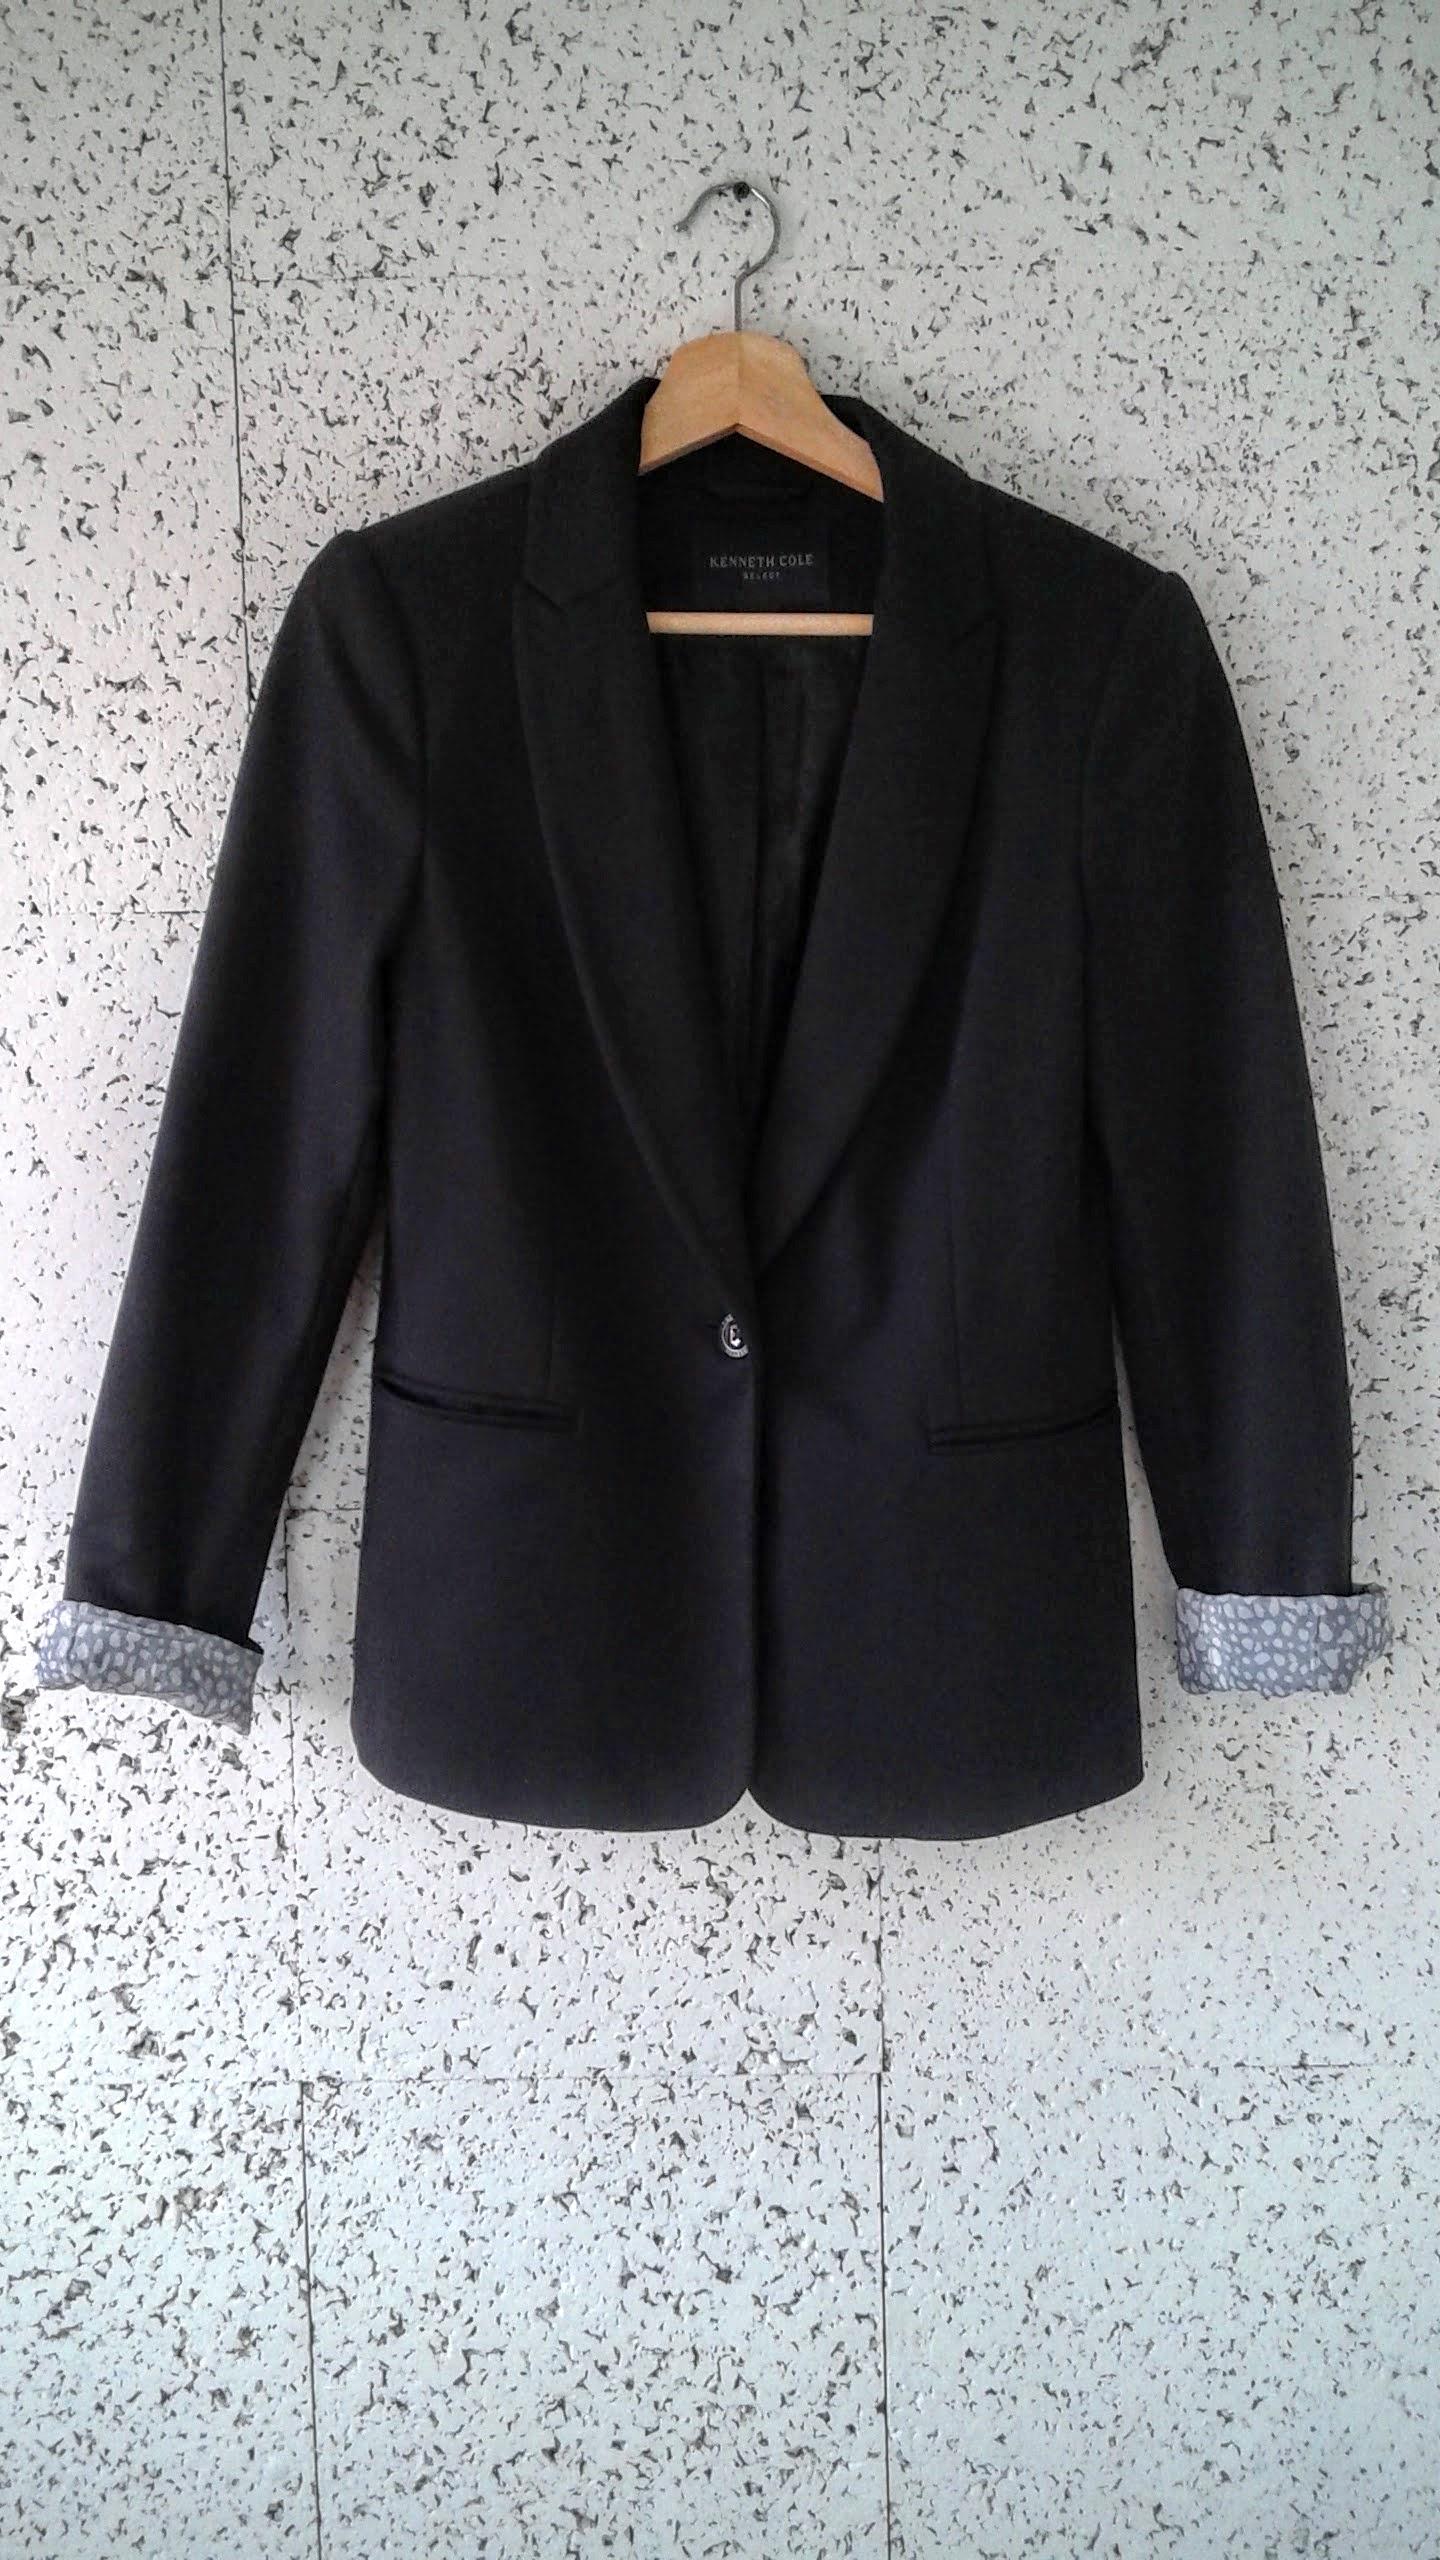 Kenneth Cole blazer; Size S, $40